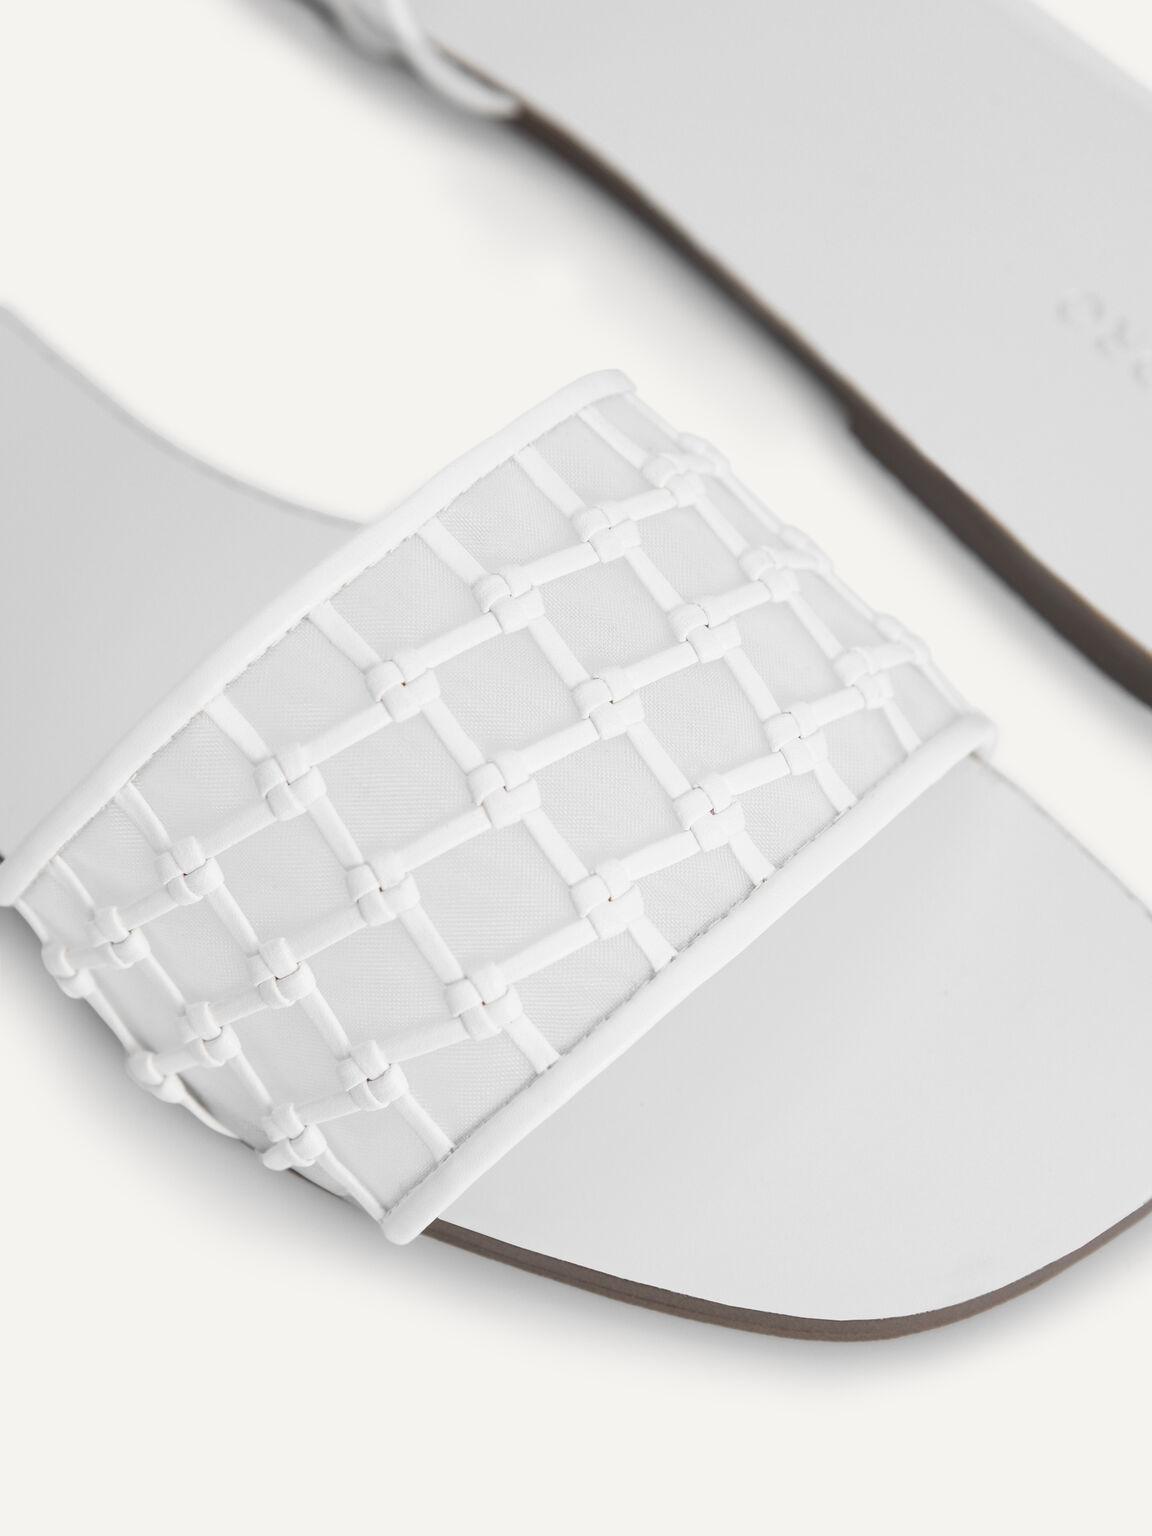 Woven Mesh Slide Sandals, White, hi-res